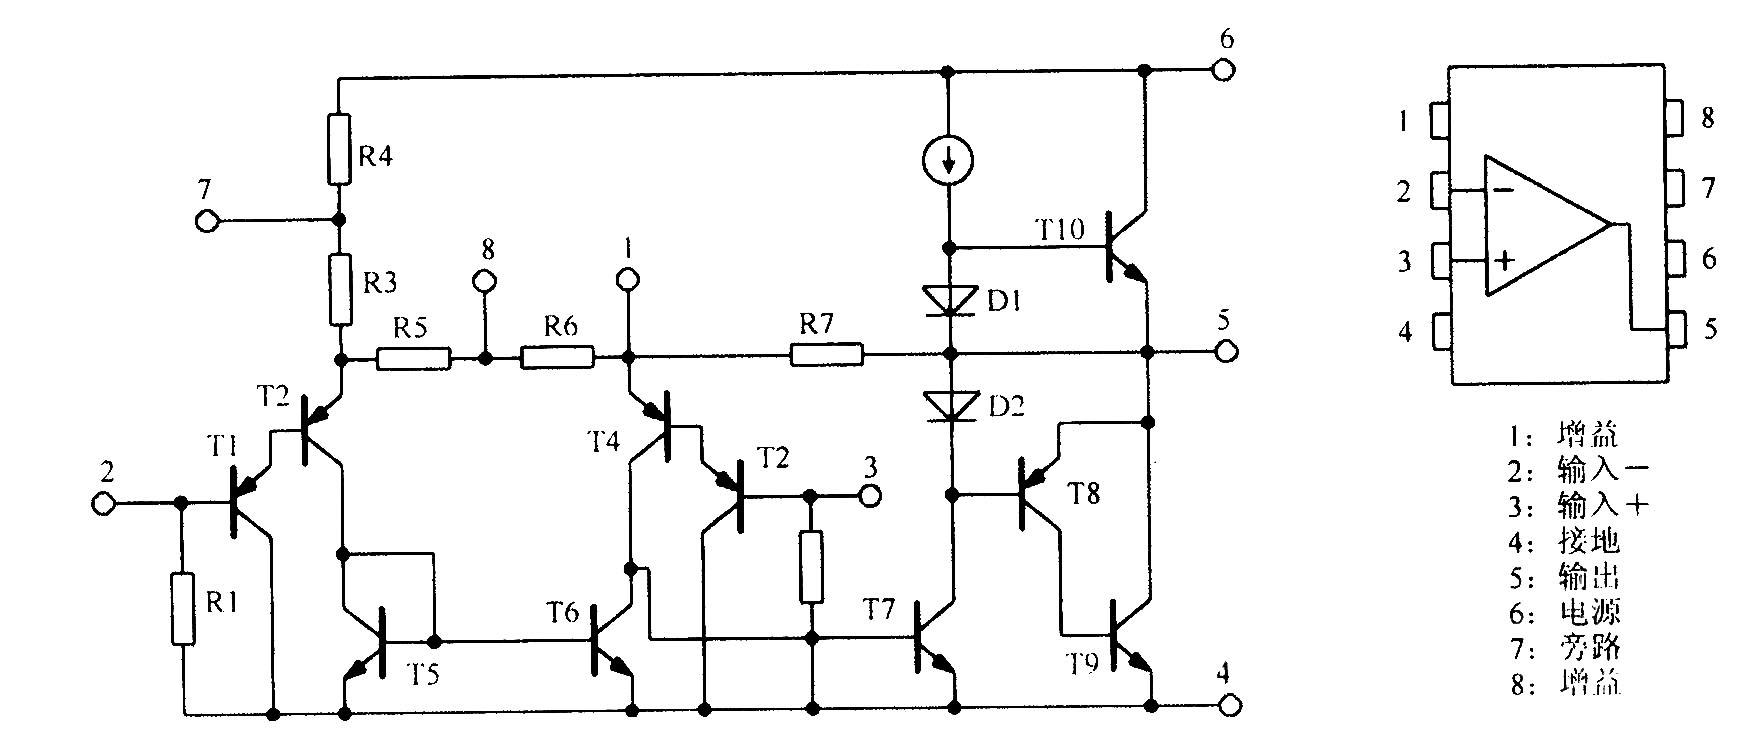 lm386 电路的放大倍数怎么调节